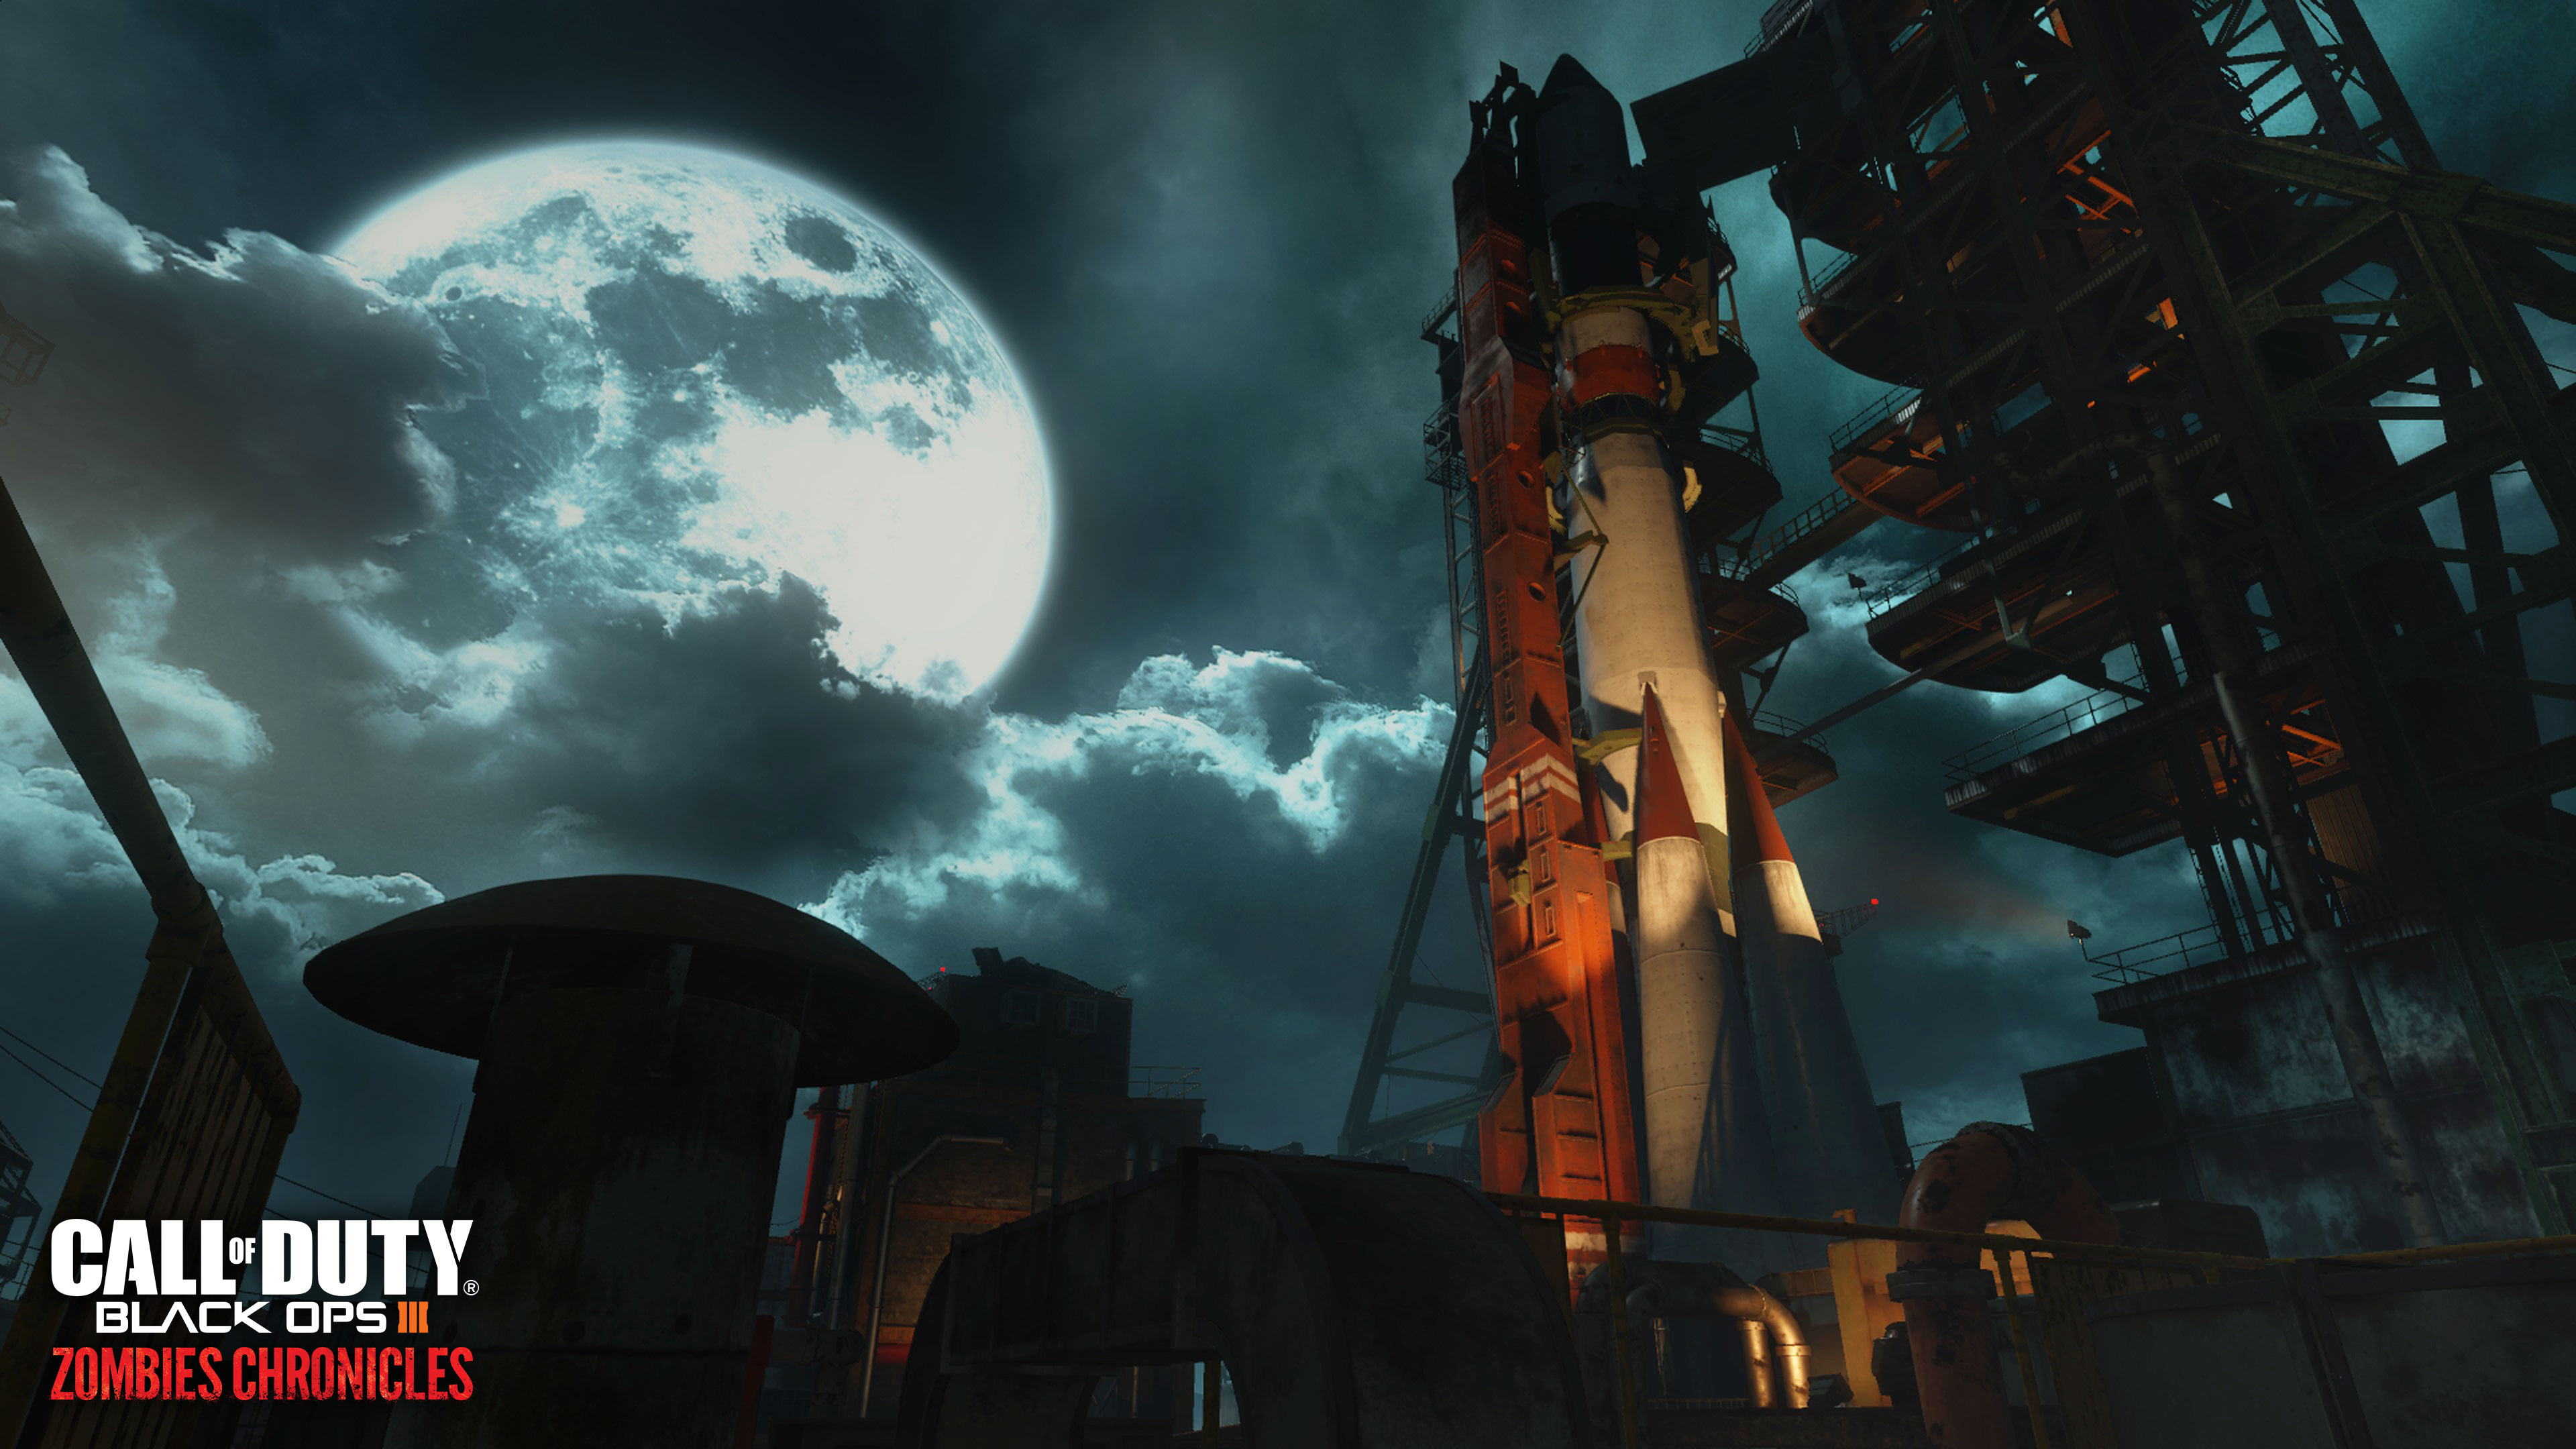 Vychází Call of Duty: Black Ops 3 - Zombies Chronicles pro PS4 144067